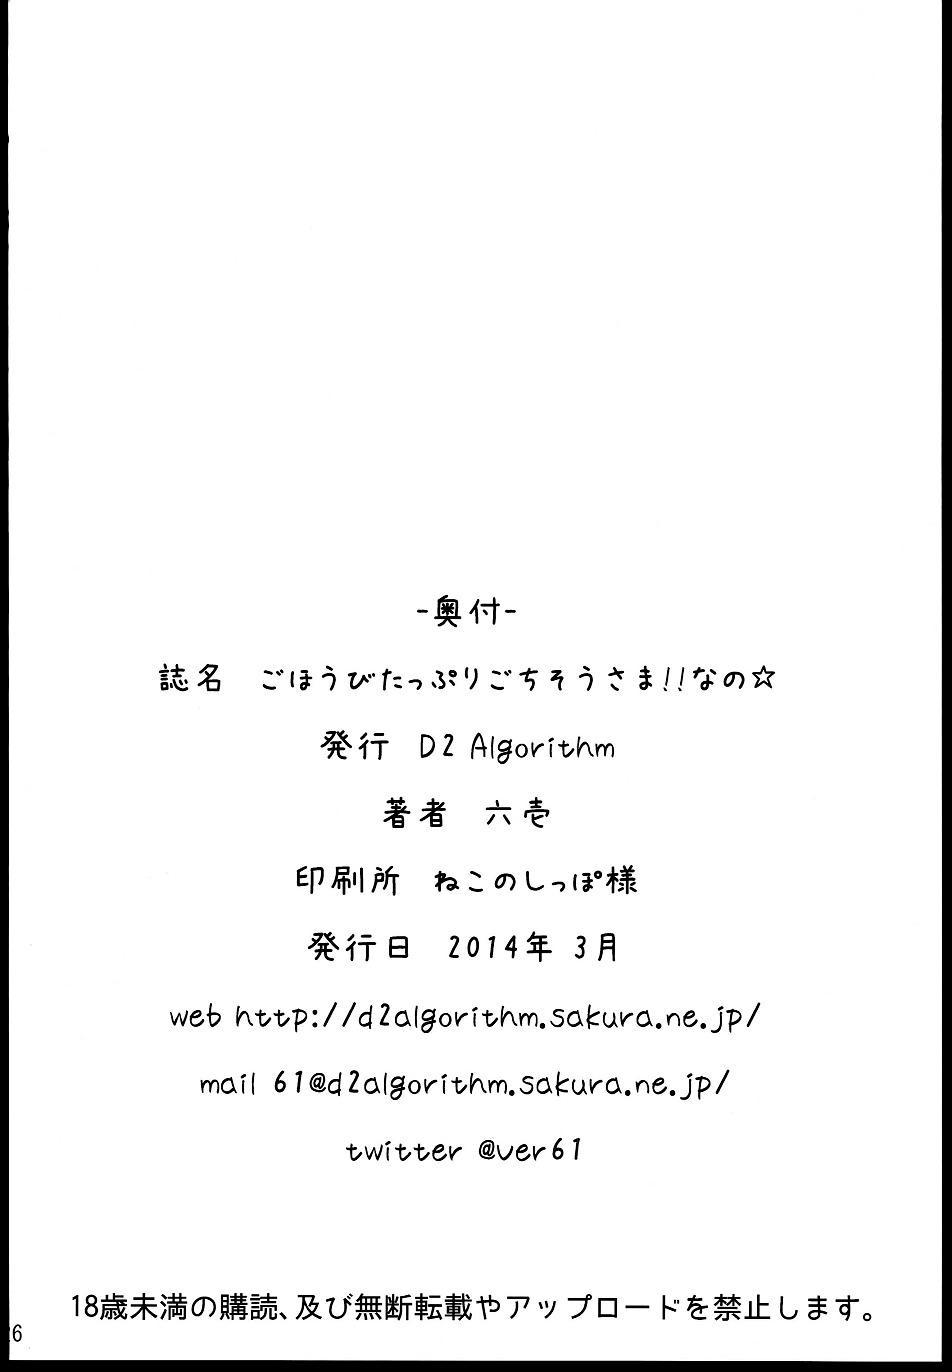 Gohoubi Tappuri Gochisousama Nano   Thank You for Such a Plentiful Reward!! 24